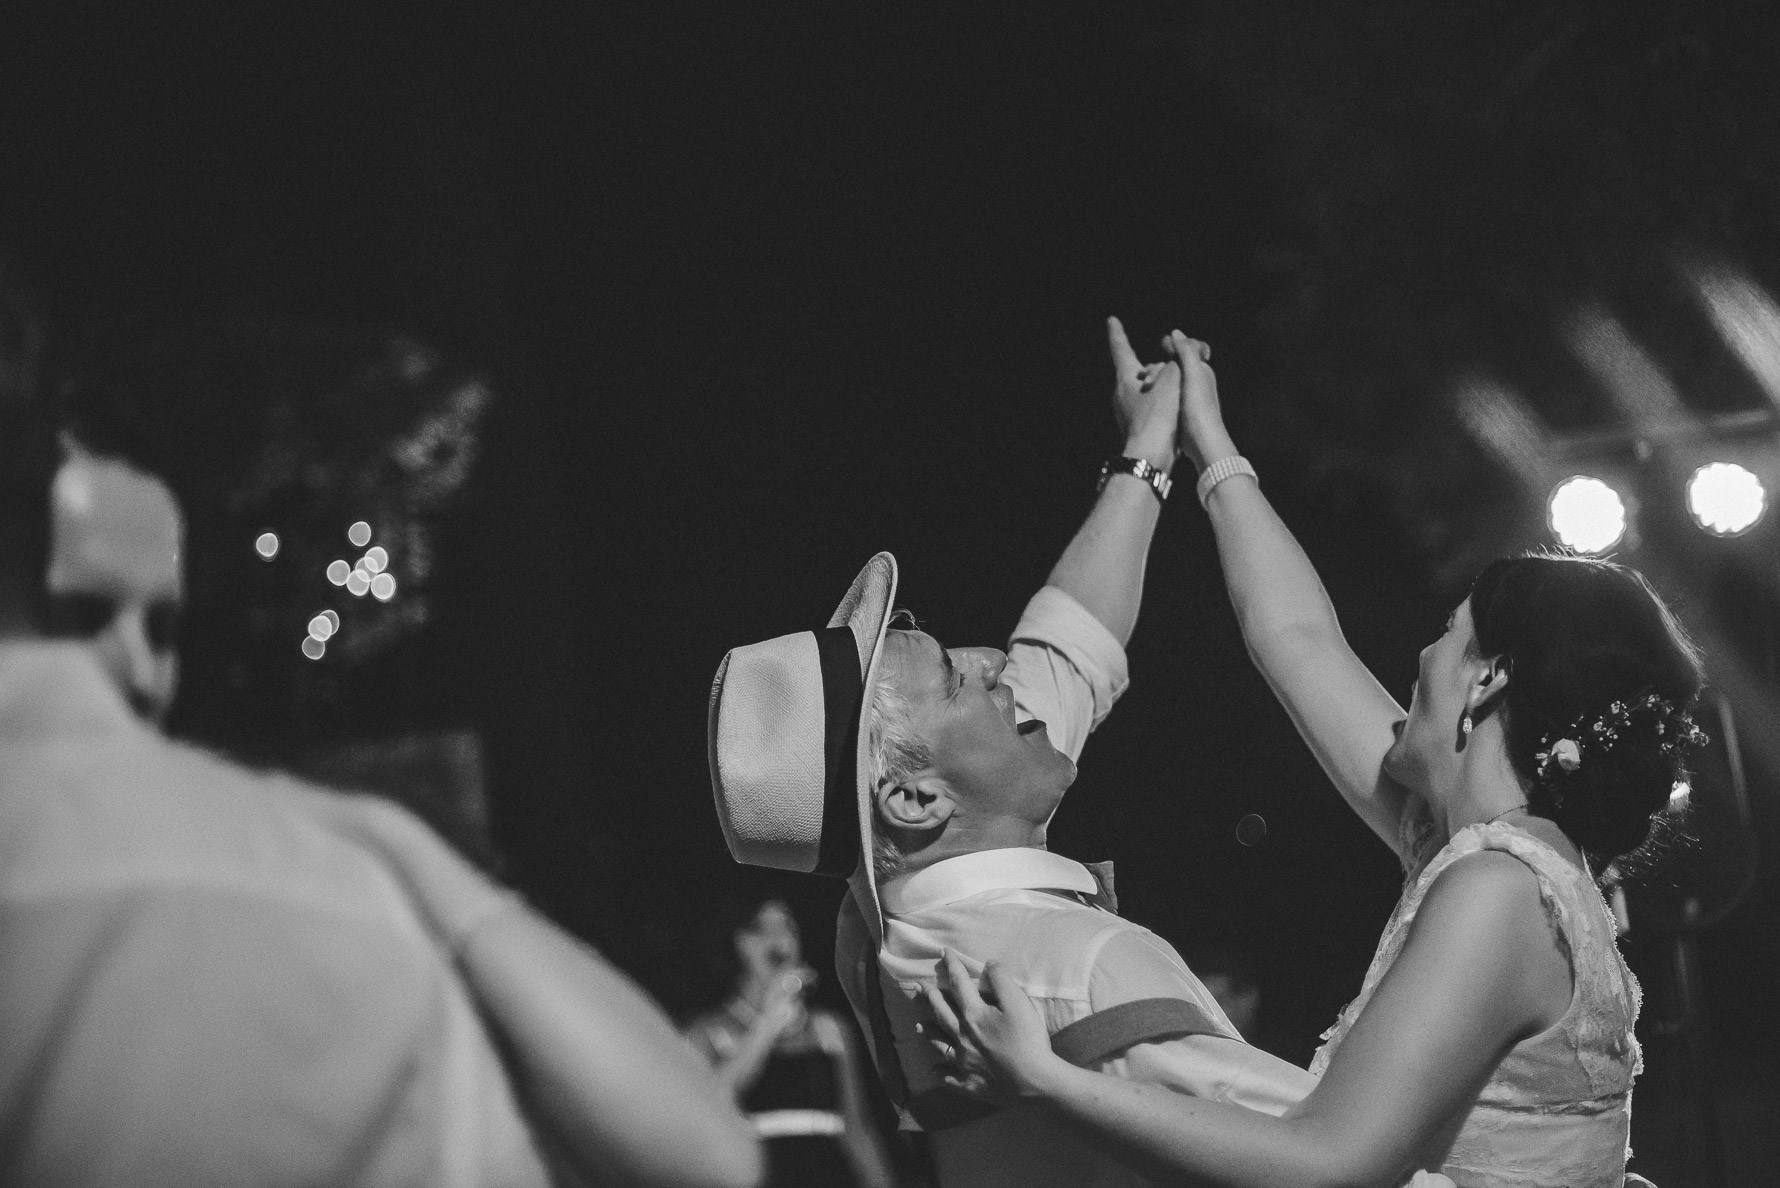 documentary-wedding-photographer-in-italy